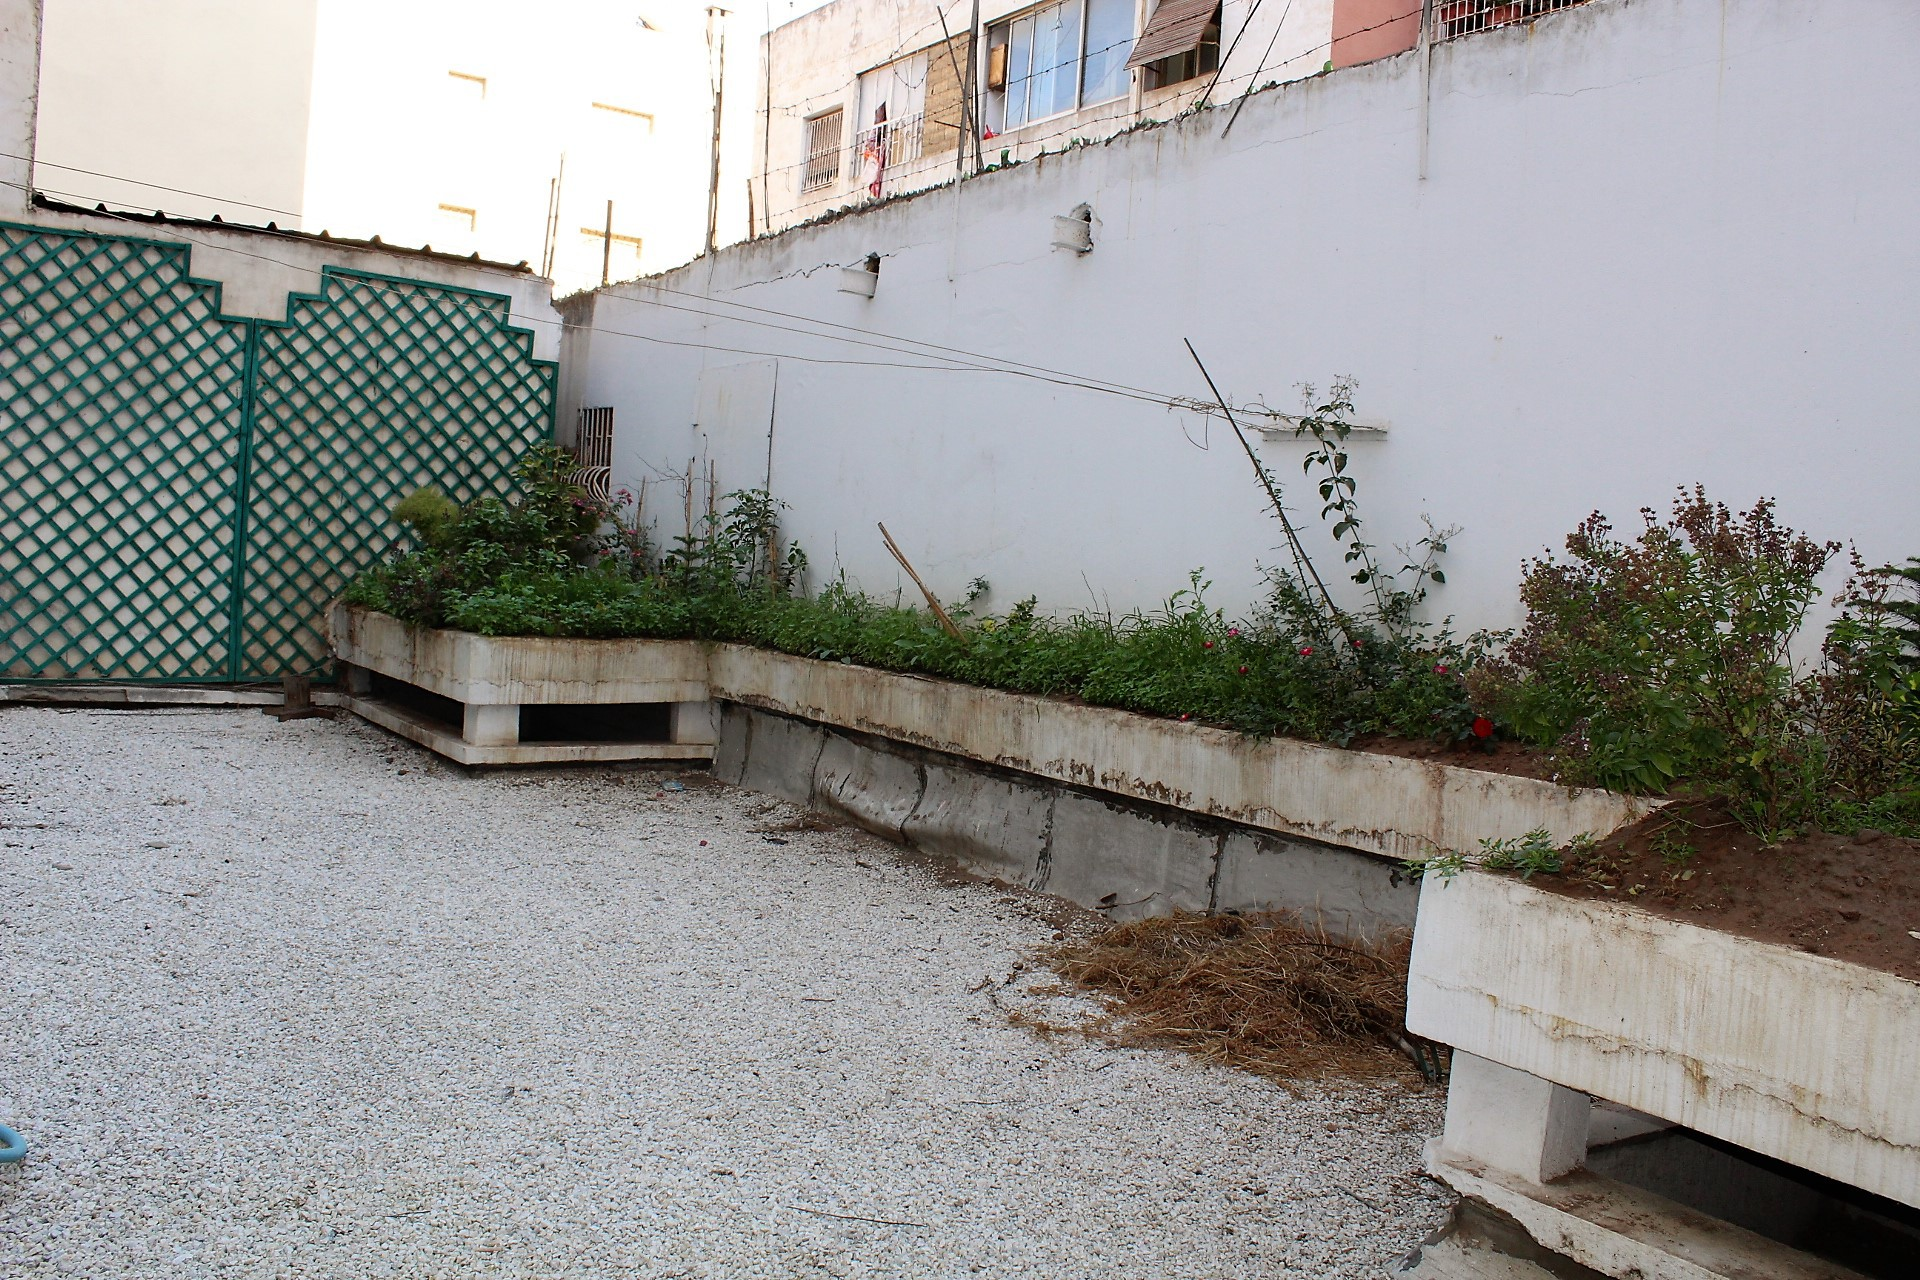 Casa,Gautier à louer appartement de 256 m2 terrasse et jardin urbain